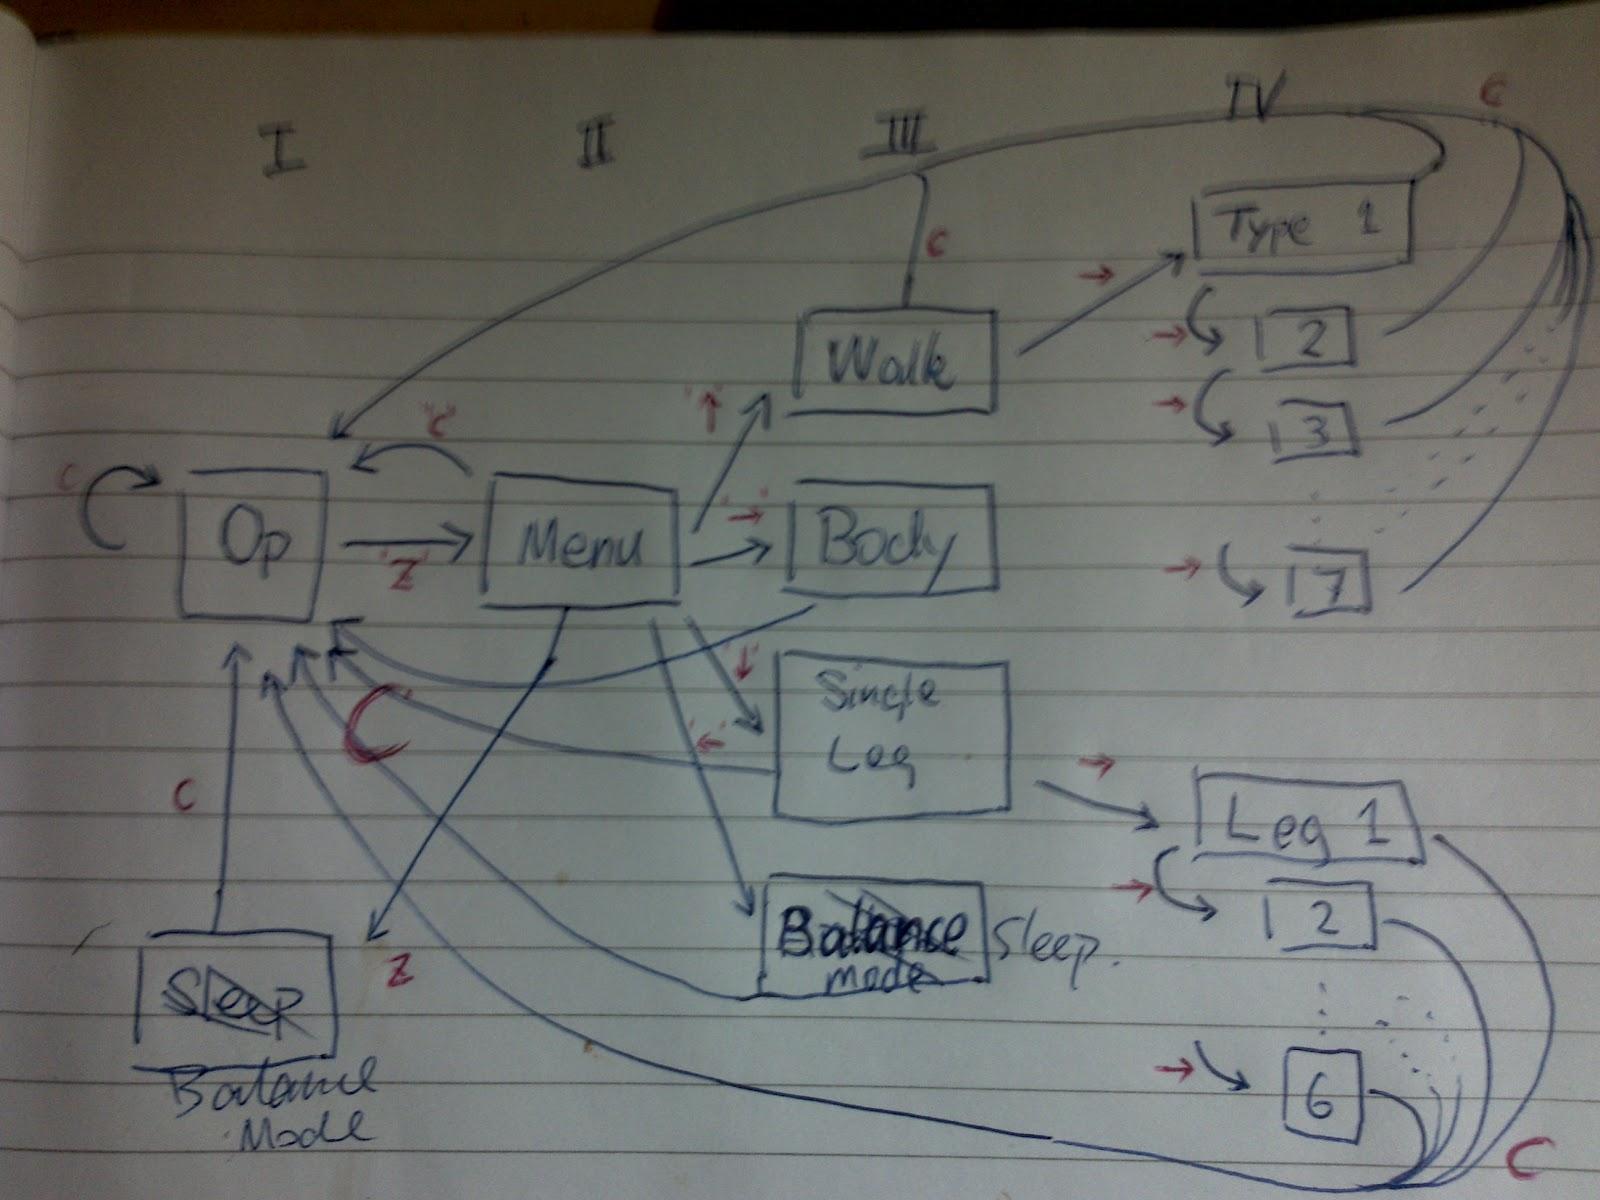 Arduino Hexapod Robot Ik Algorithm And Source Code Oscar Liang Sainsmart Joystick Wiring Diagram Update 03 04 2012